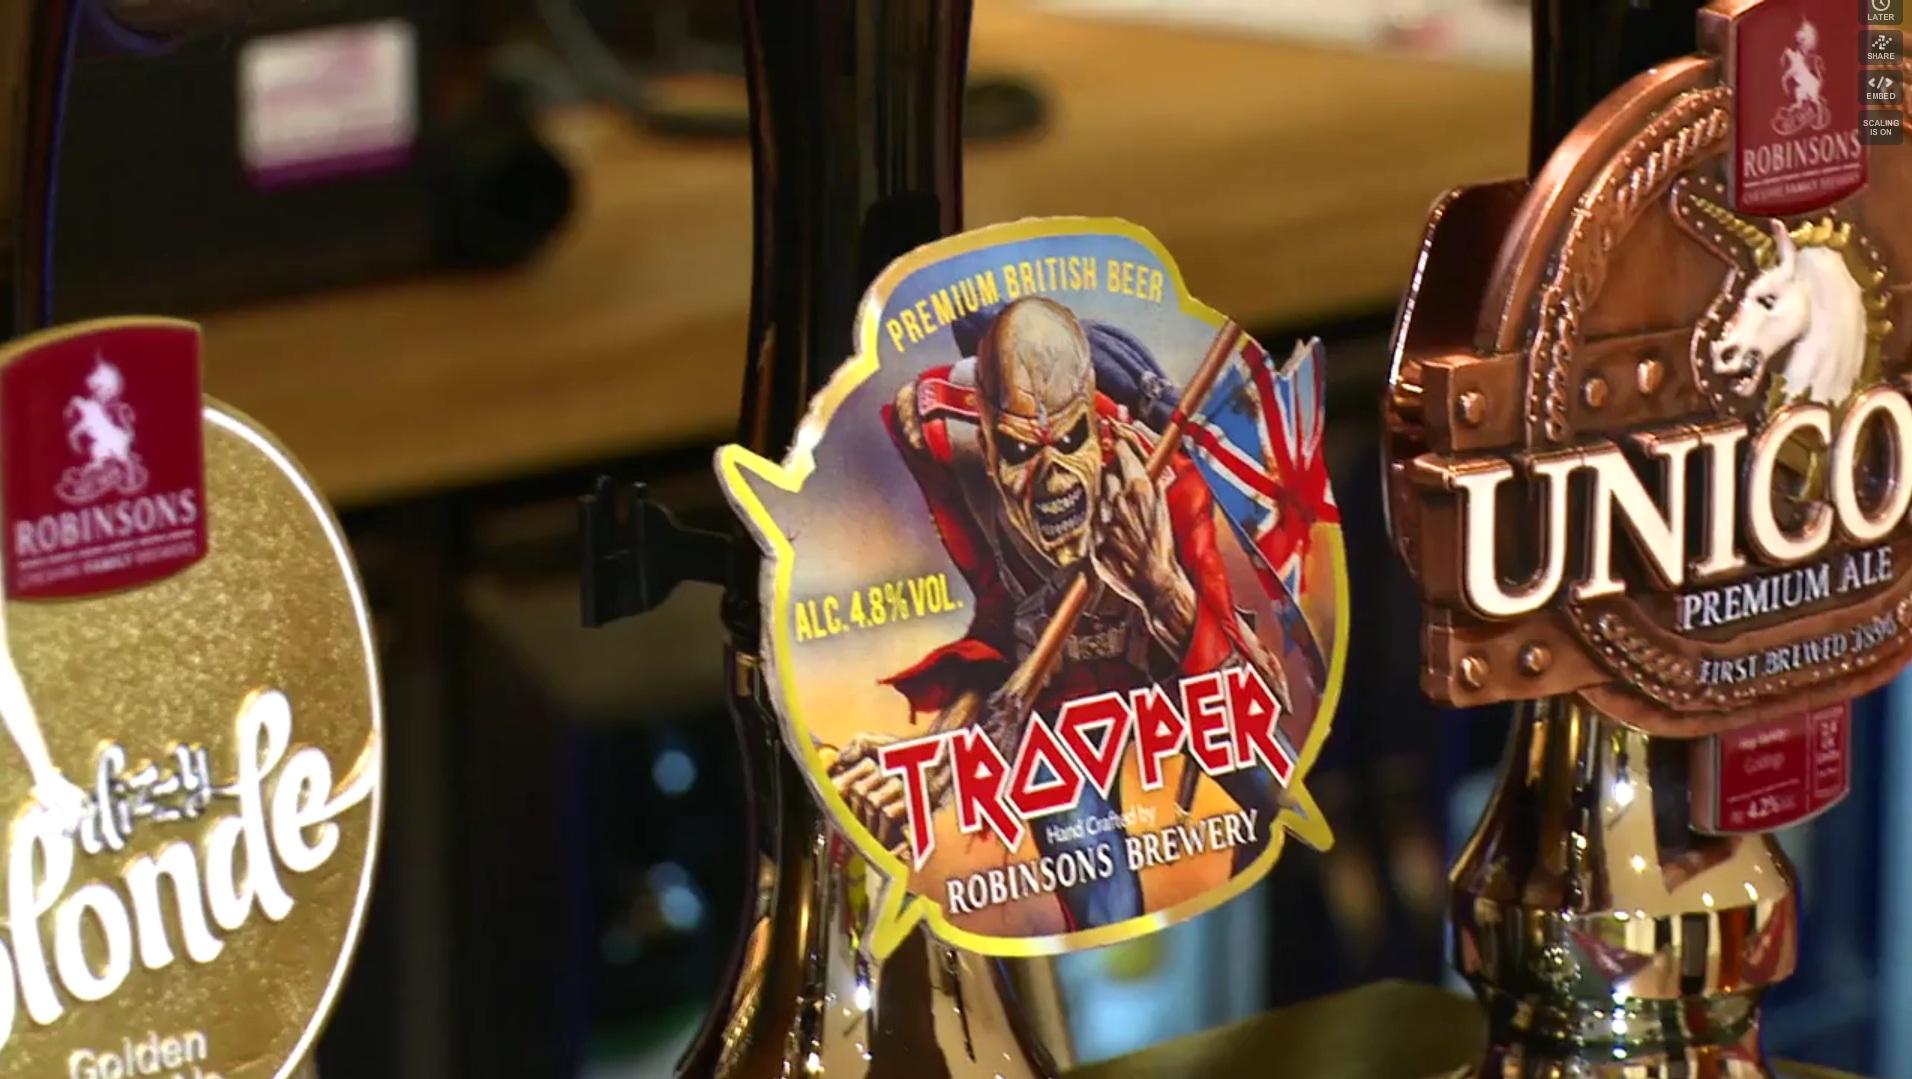 iron-maiden-trooper-ale